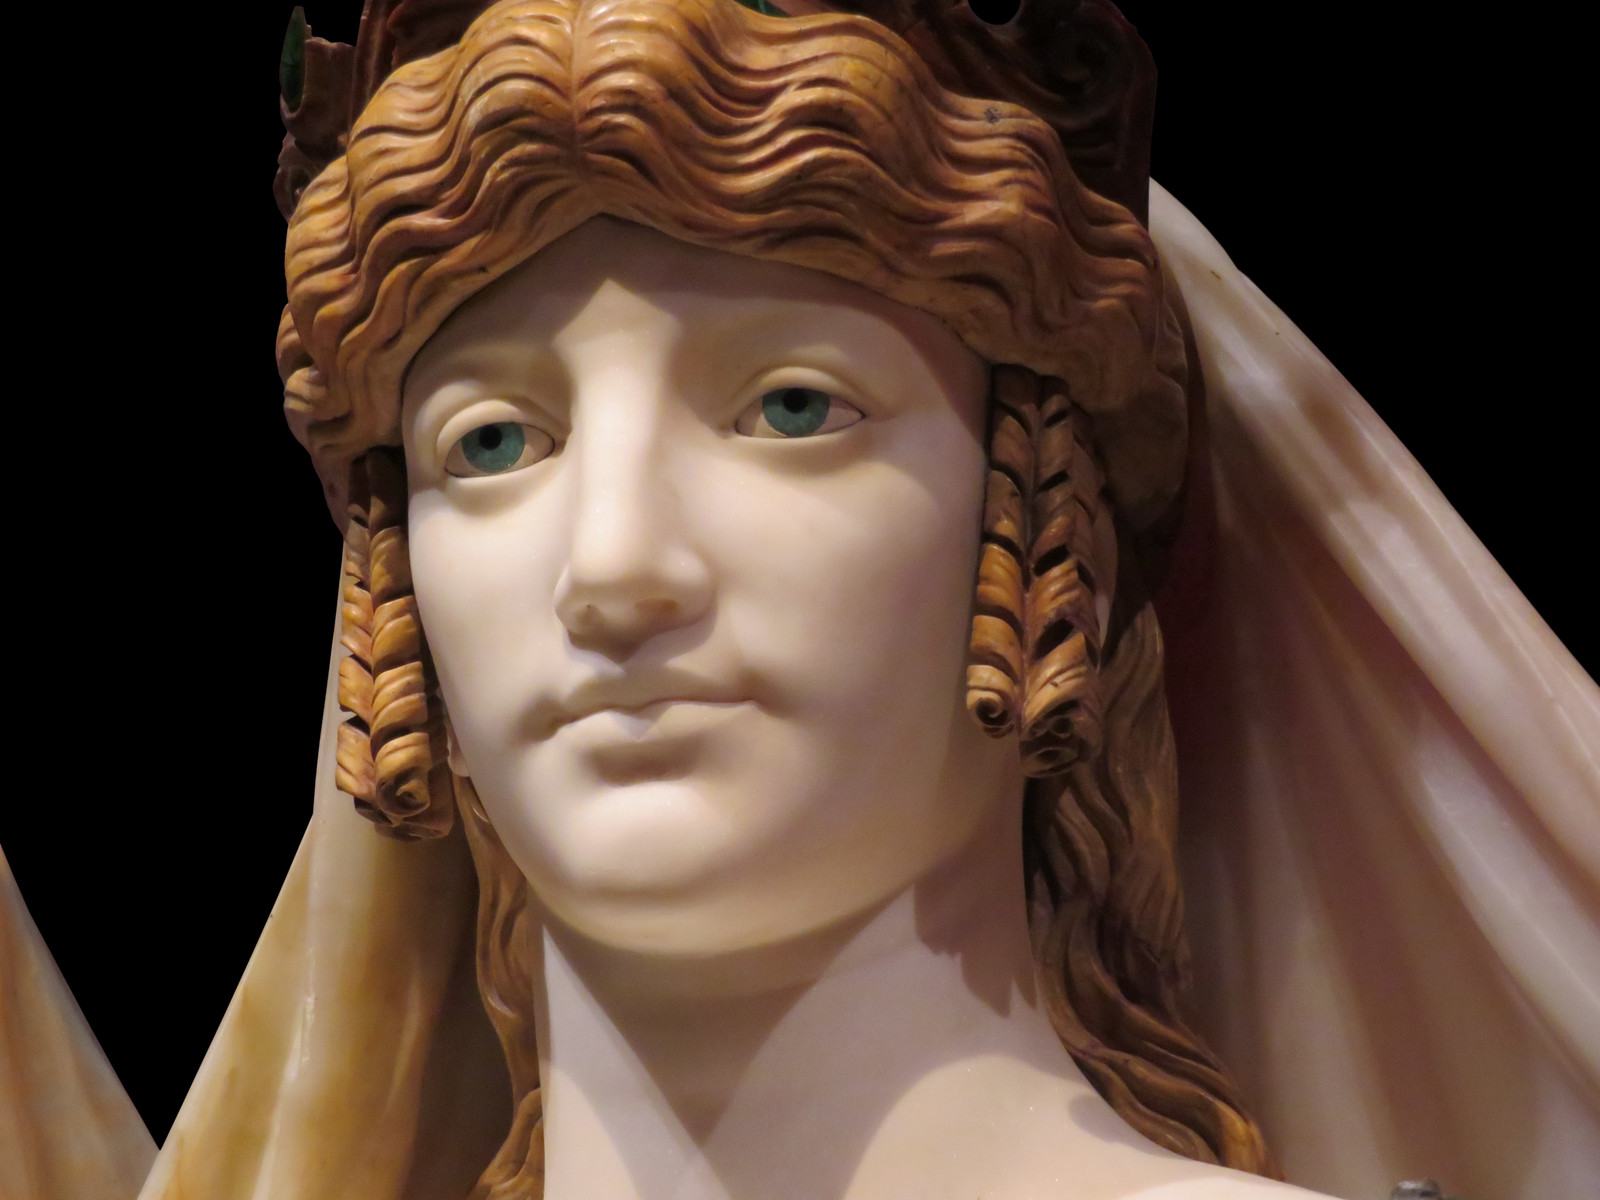 Елена троянская картинки